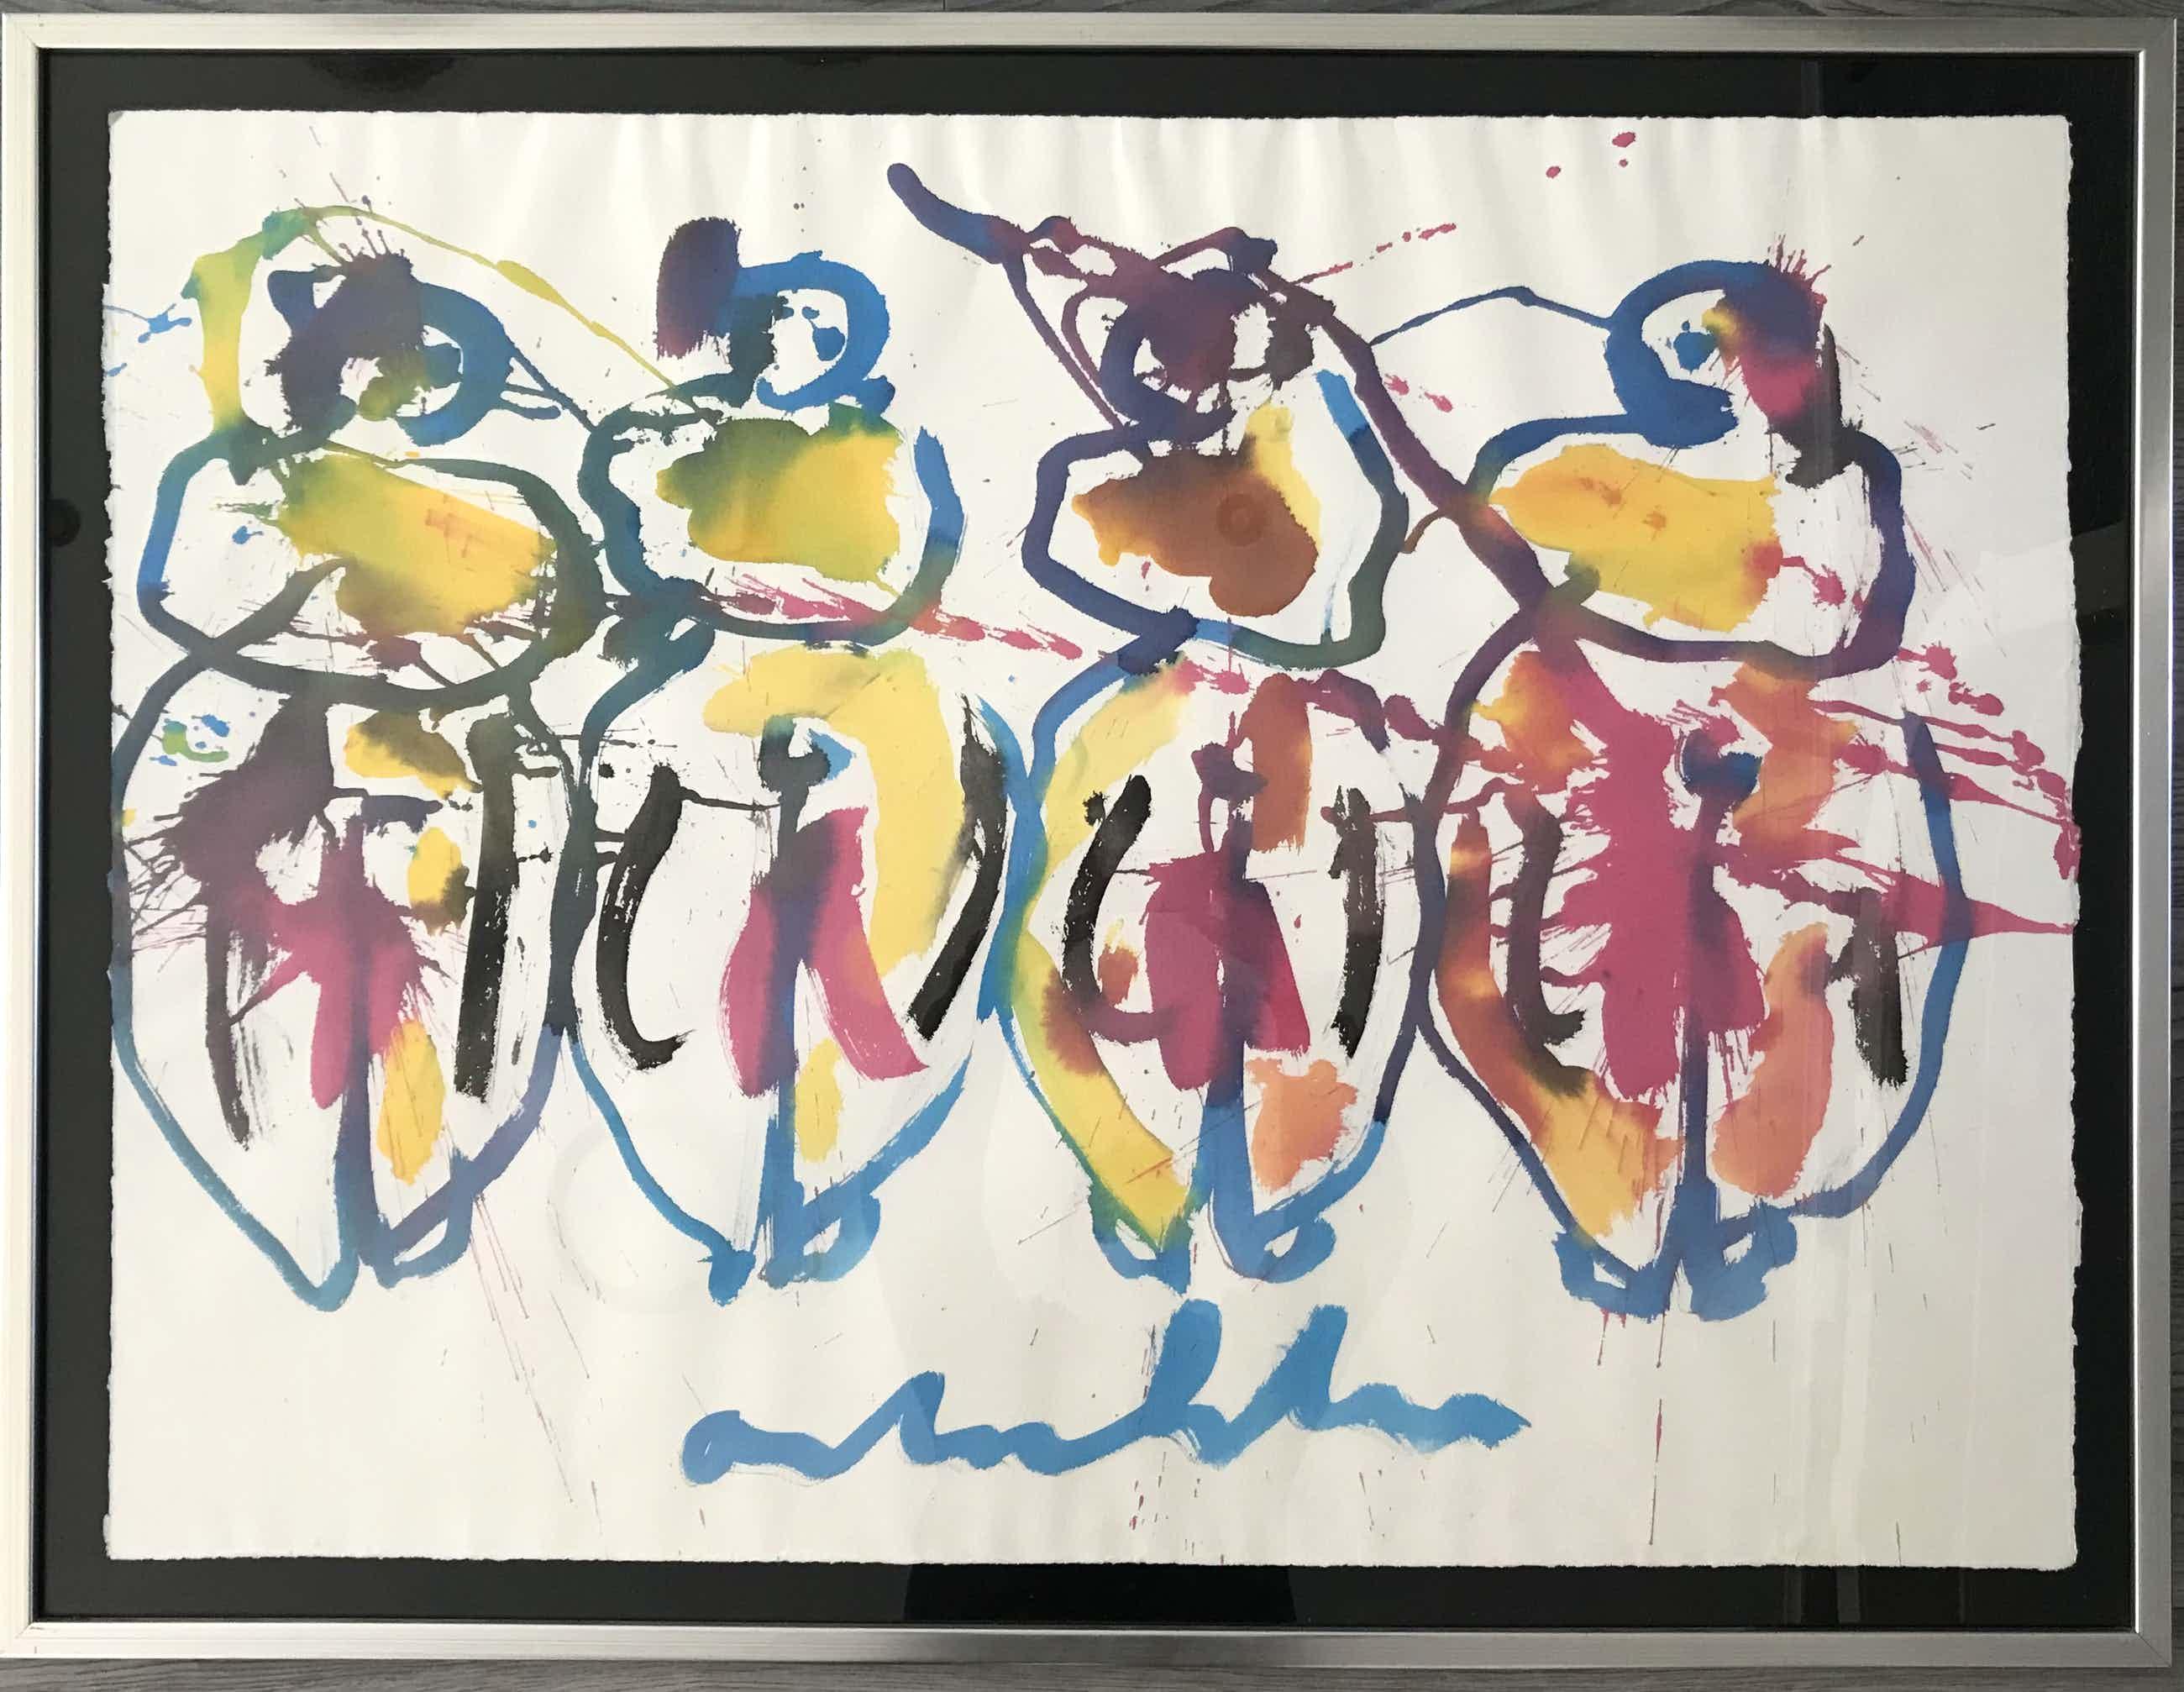 Anton Heyboer - 4 vrouwen - Grote aquarel kopen? Bied vanaf 550!